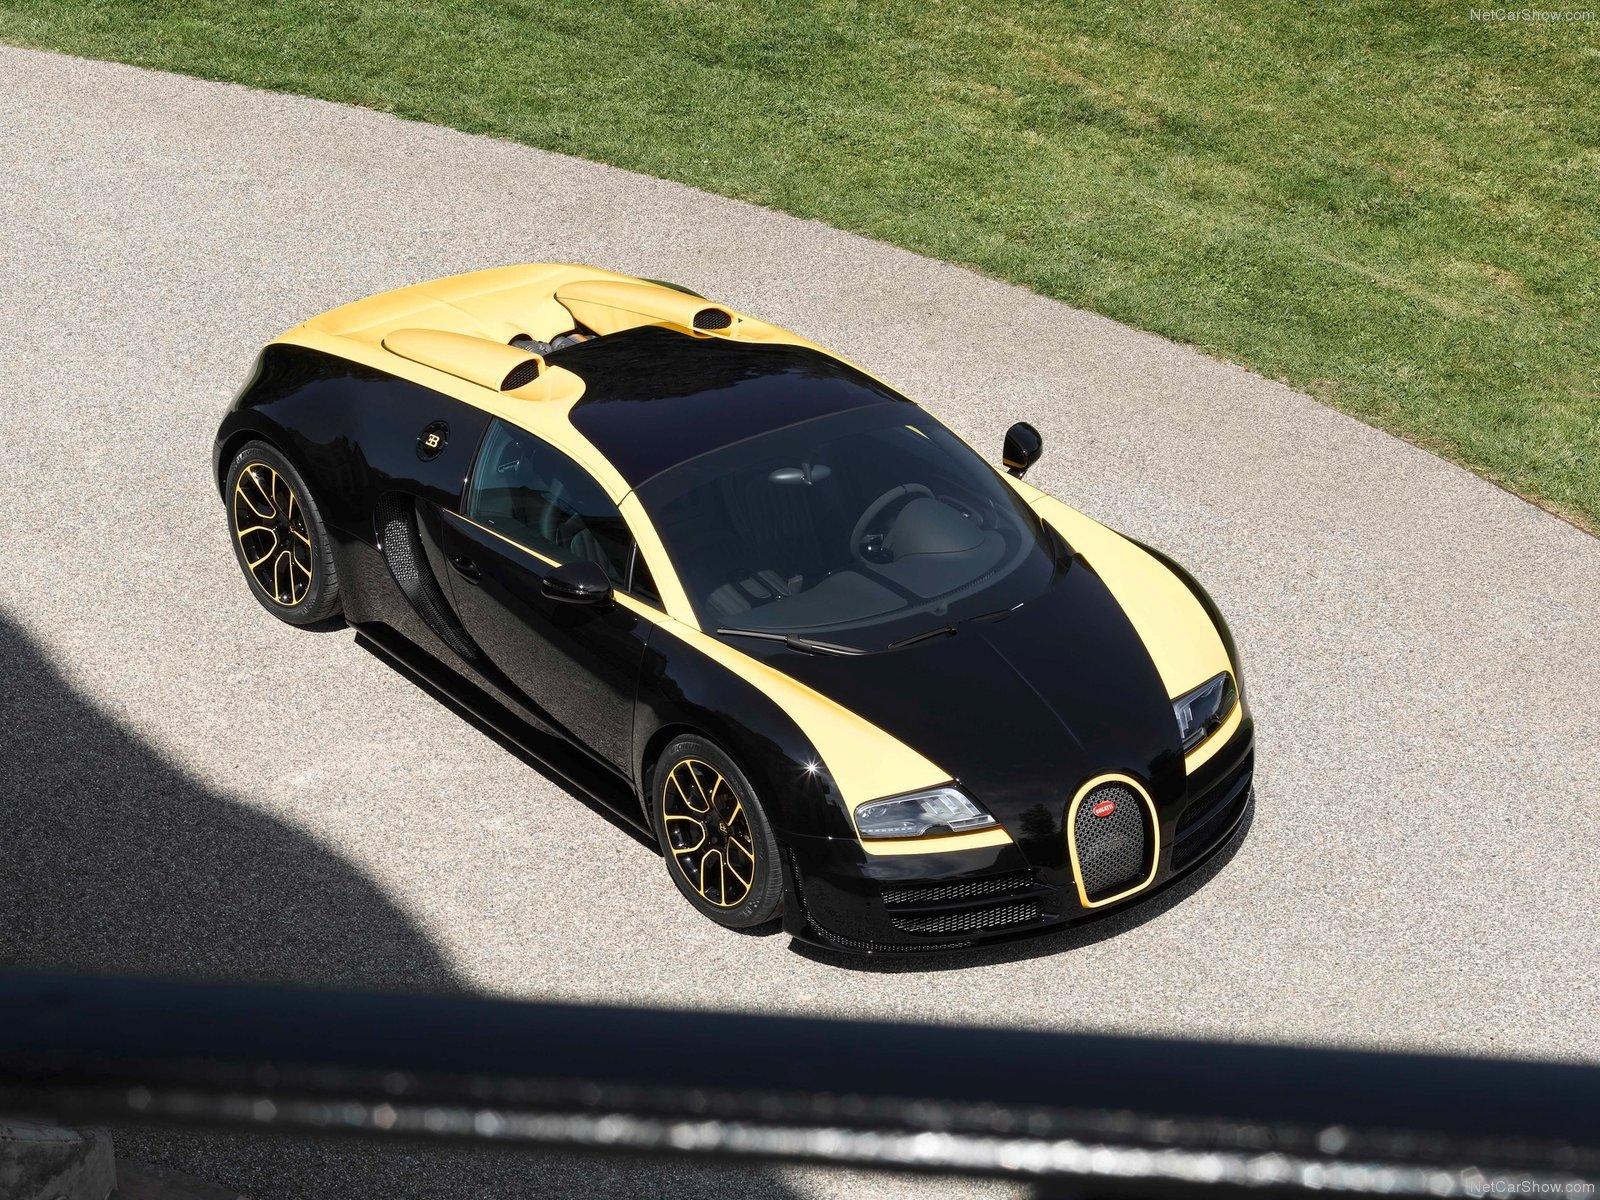 2014%2BBugatti%2BVeyron%2BGrand%2BSport%2BVitesse%2B1of1%2B%25281%2529 Astounding Xe Bugatti Veyron Grand Sport Vitesse Cars Trend